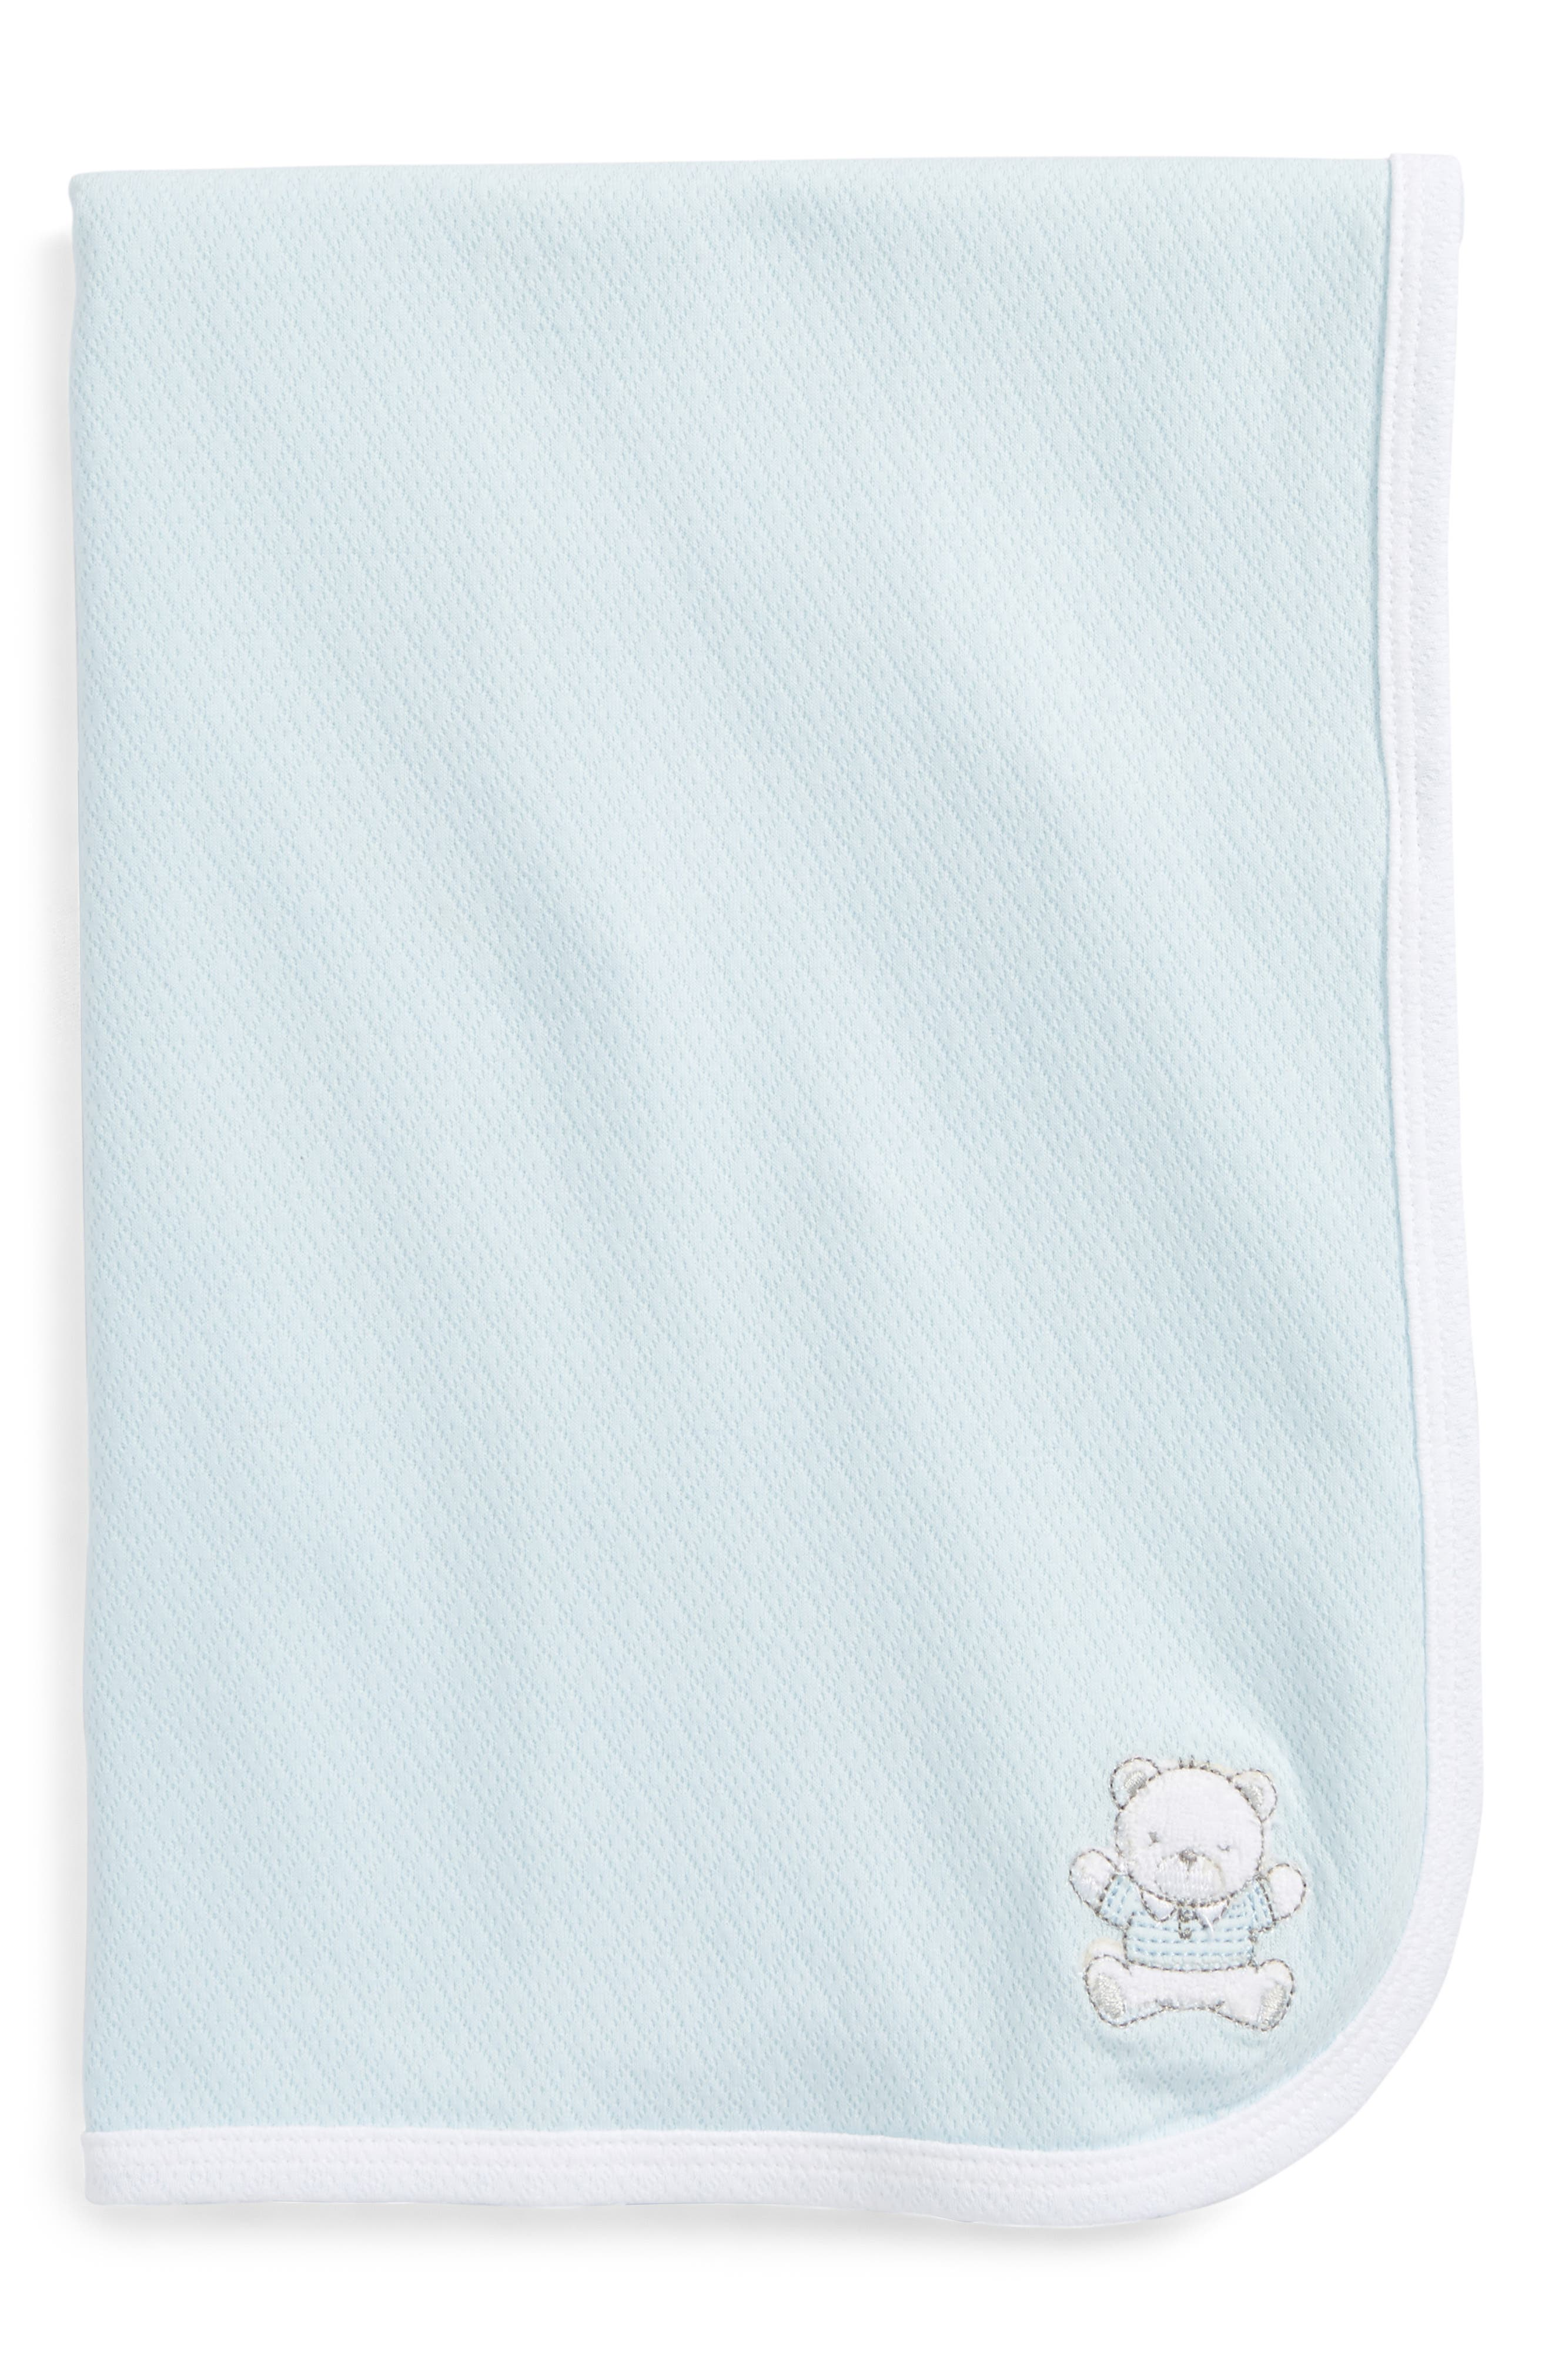 Alternate Image 1 Selected - Little Me Bear Receiving Blanket (Baby) (Nordstrom Exclusive)